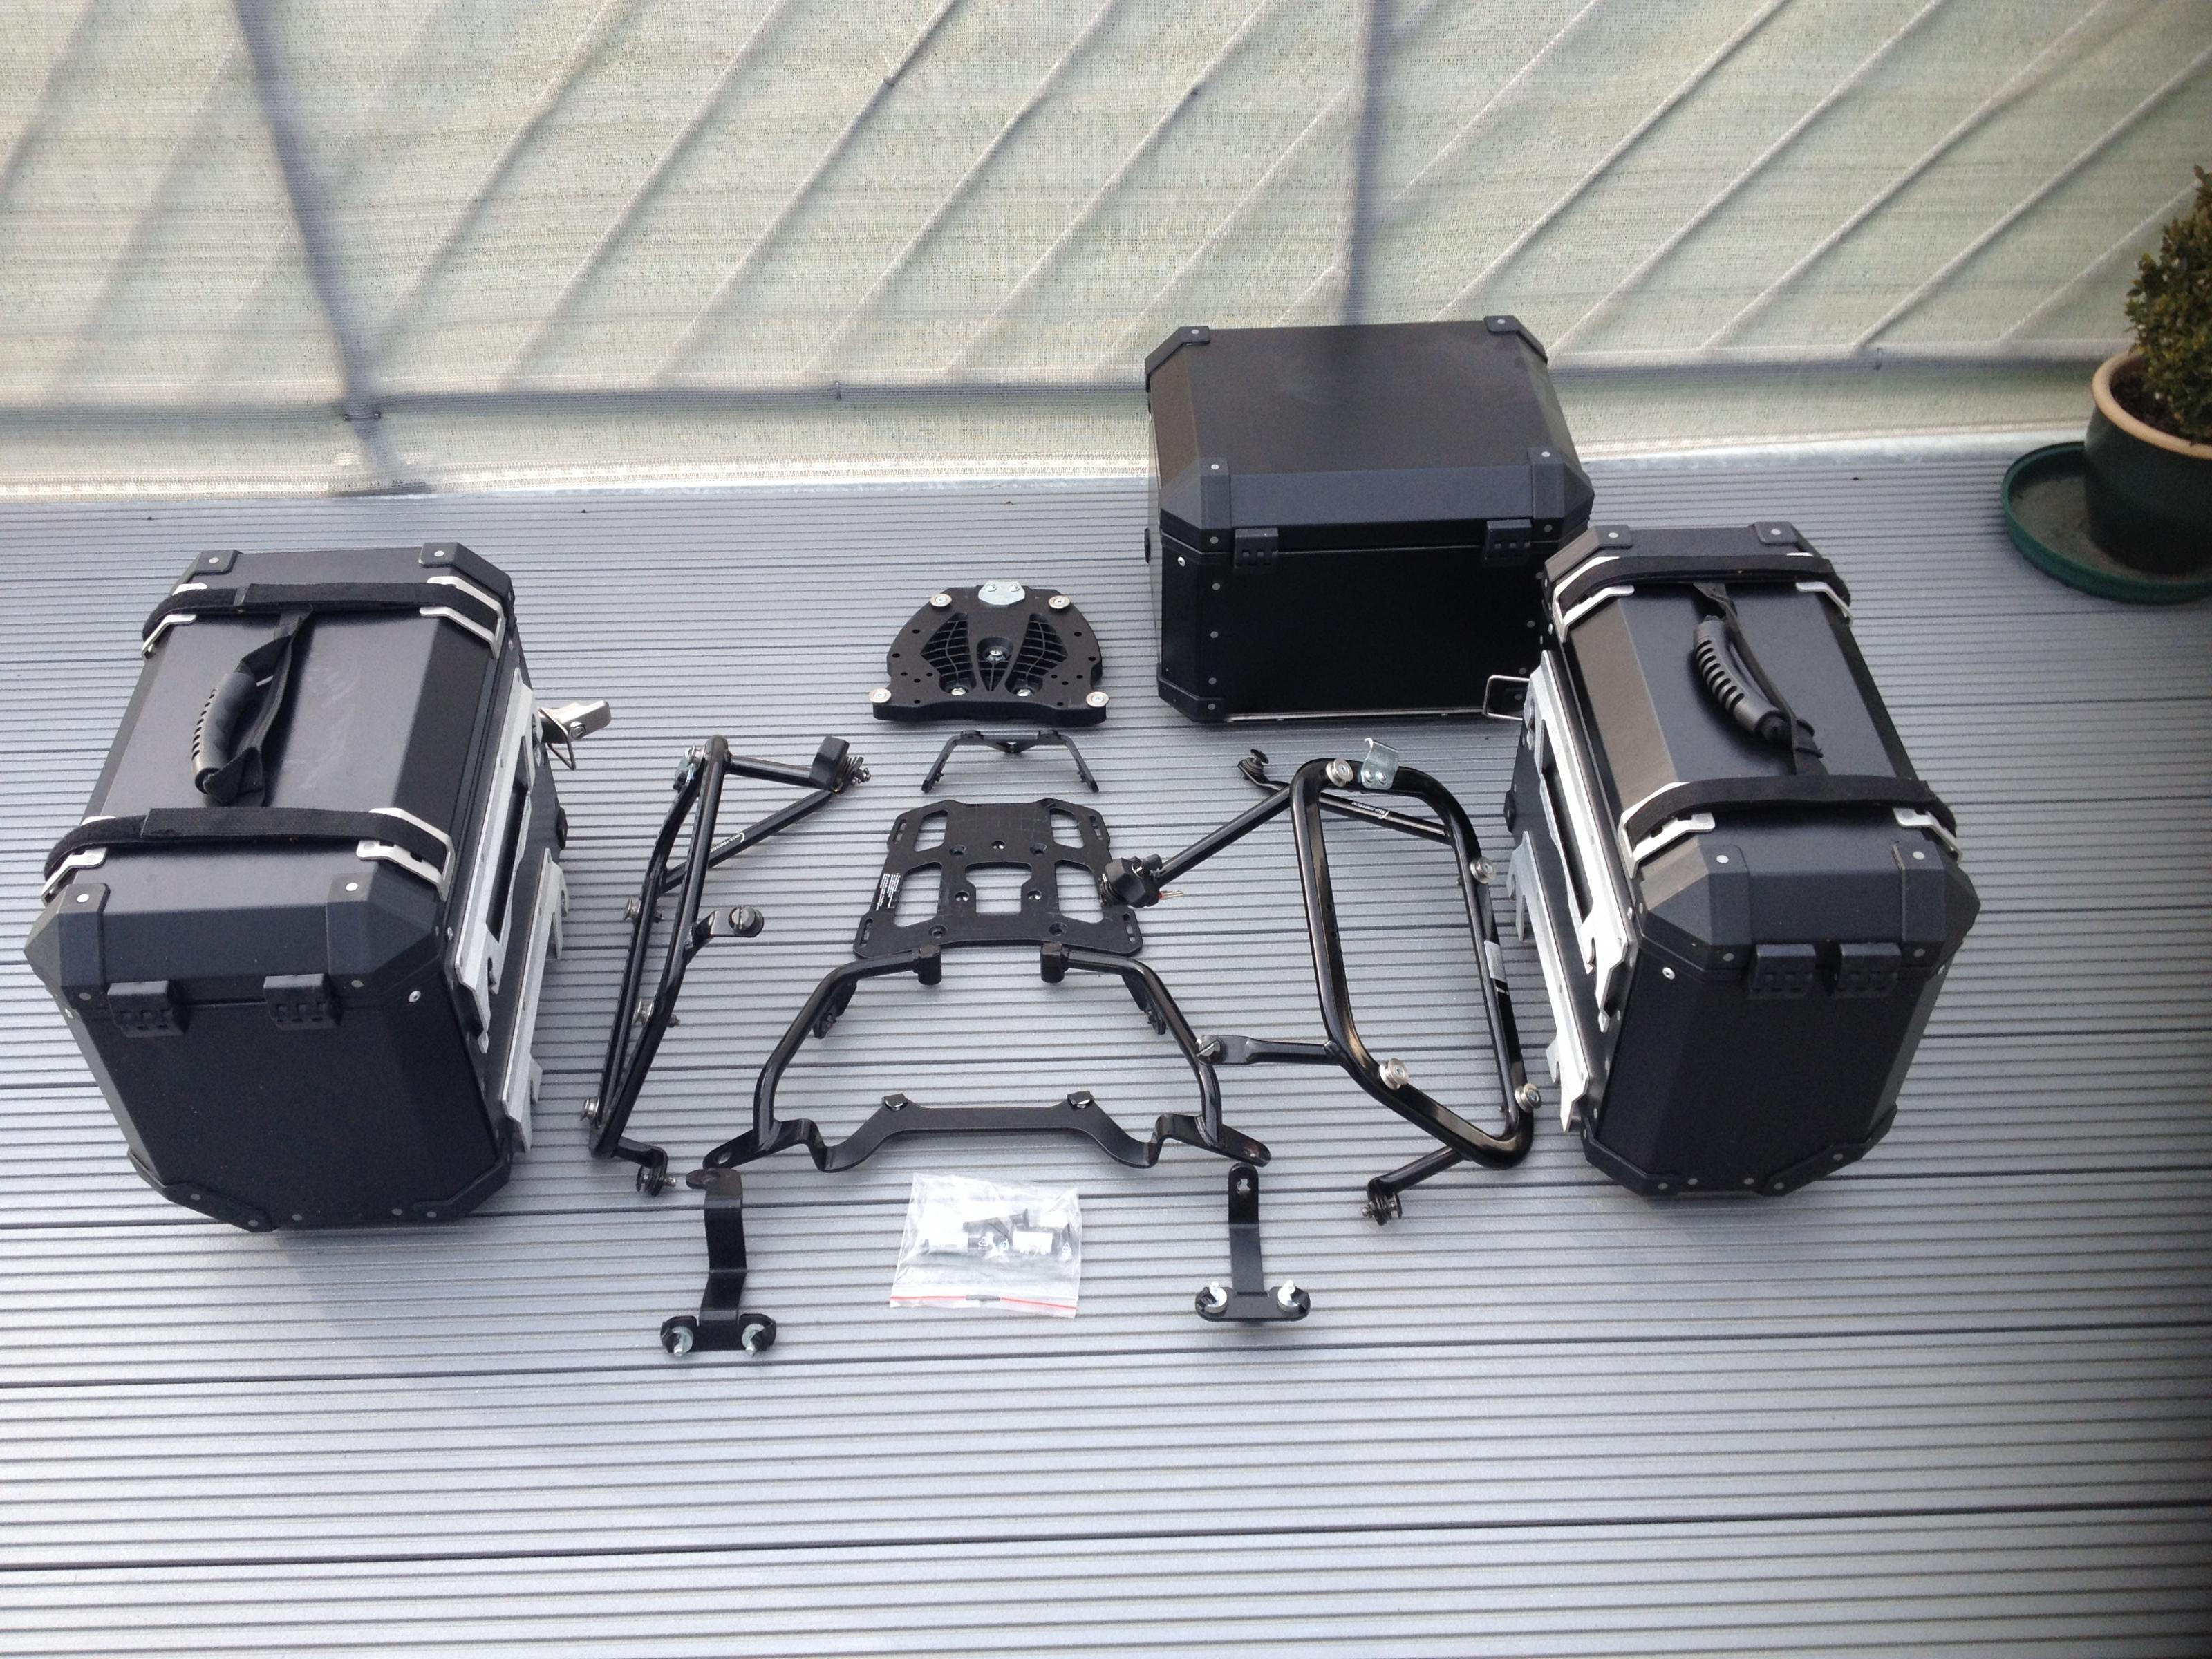 erledigt kofferset f 800 gs sw motech trax evo quick lock. Black Bedroom Furniture Sets. Home Design Ideas